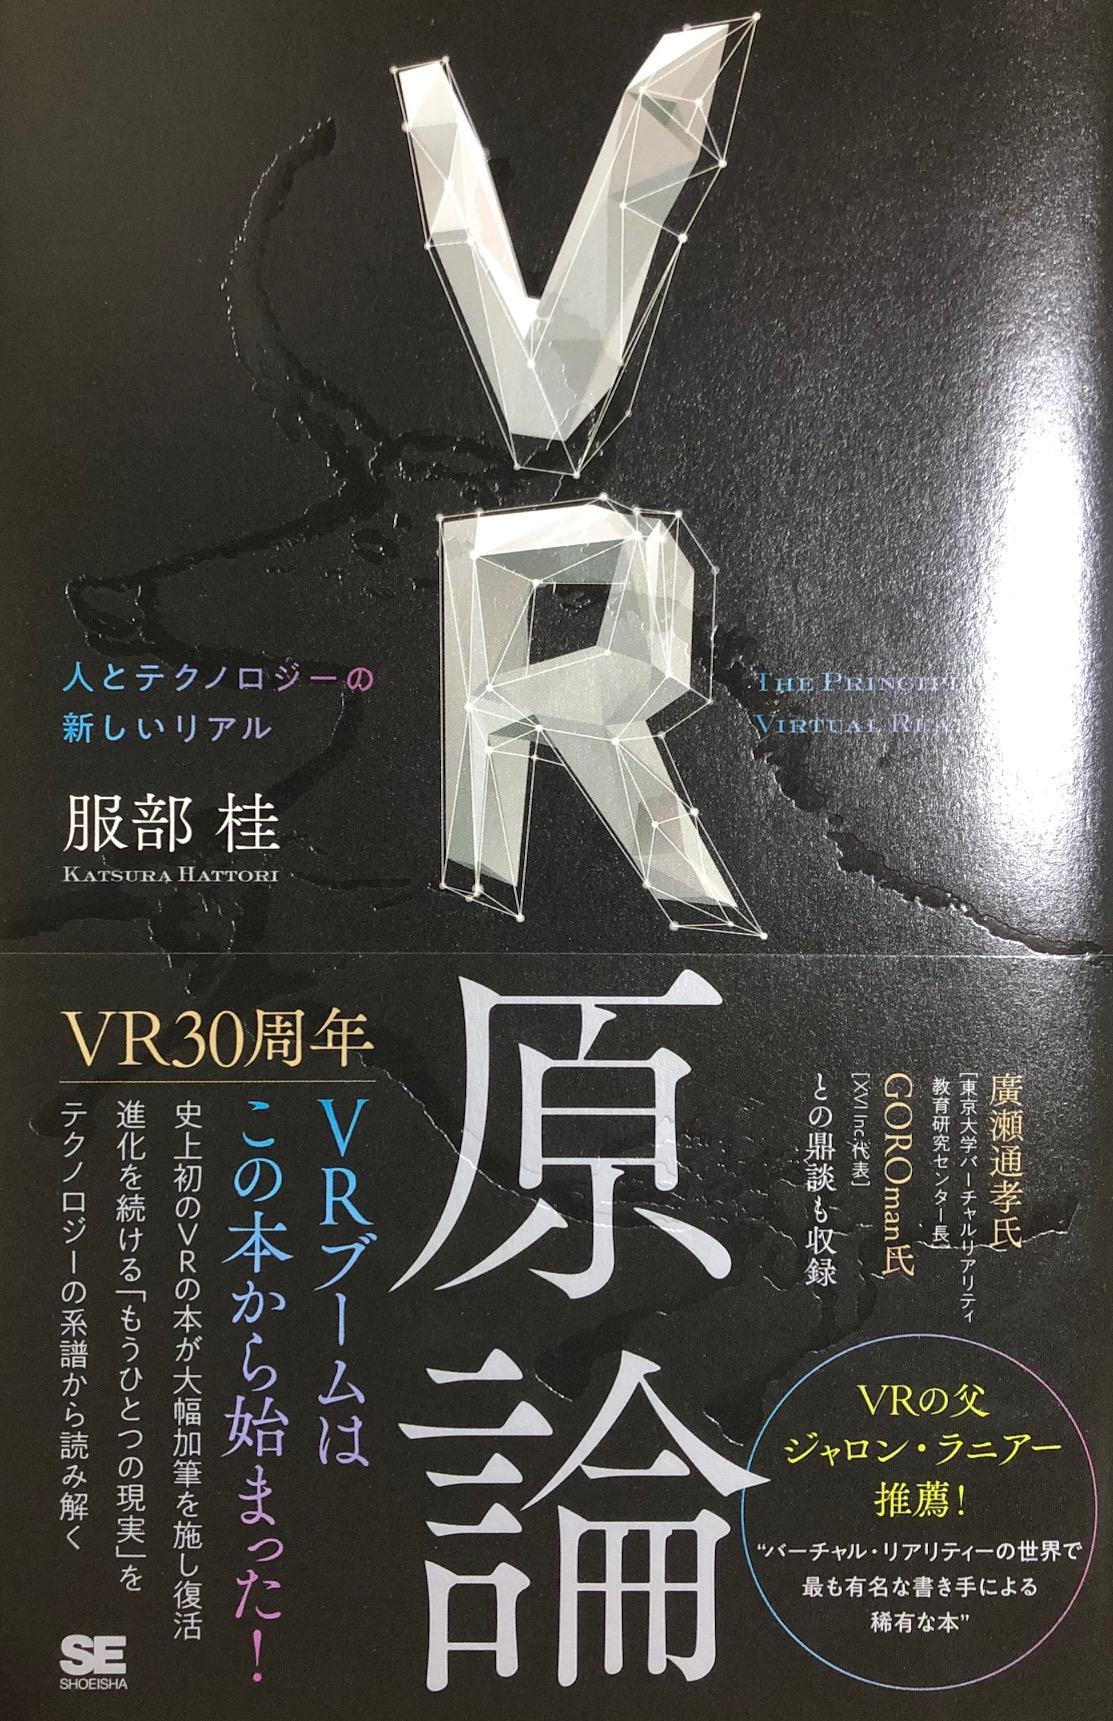 VR歴史書【VR原論 人とテクノロジーの新しいリアル】感想レビュー!